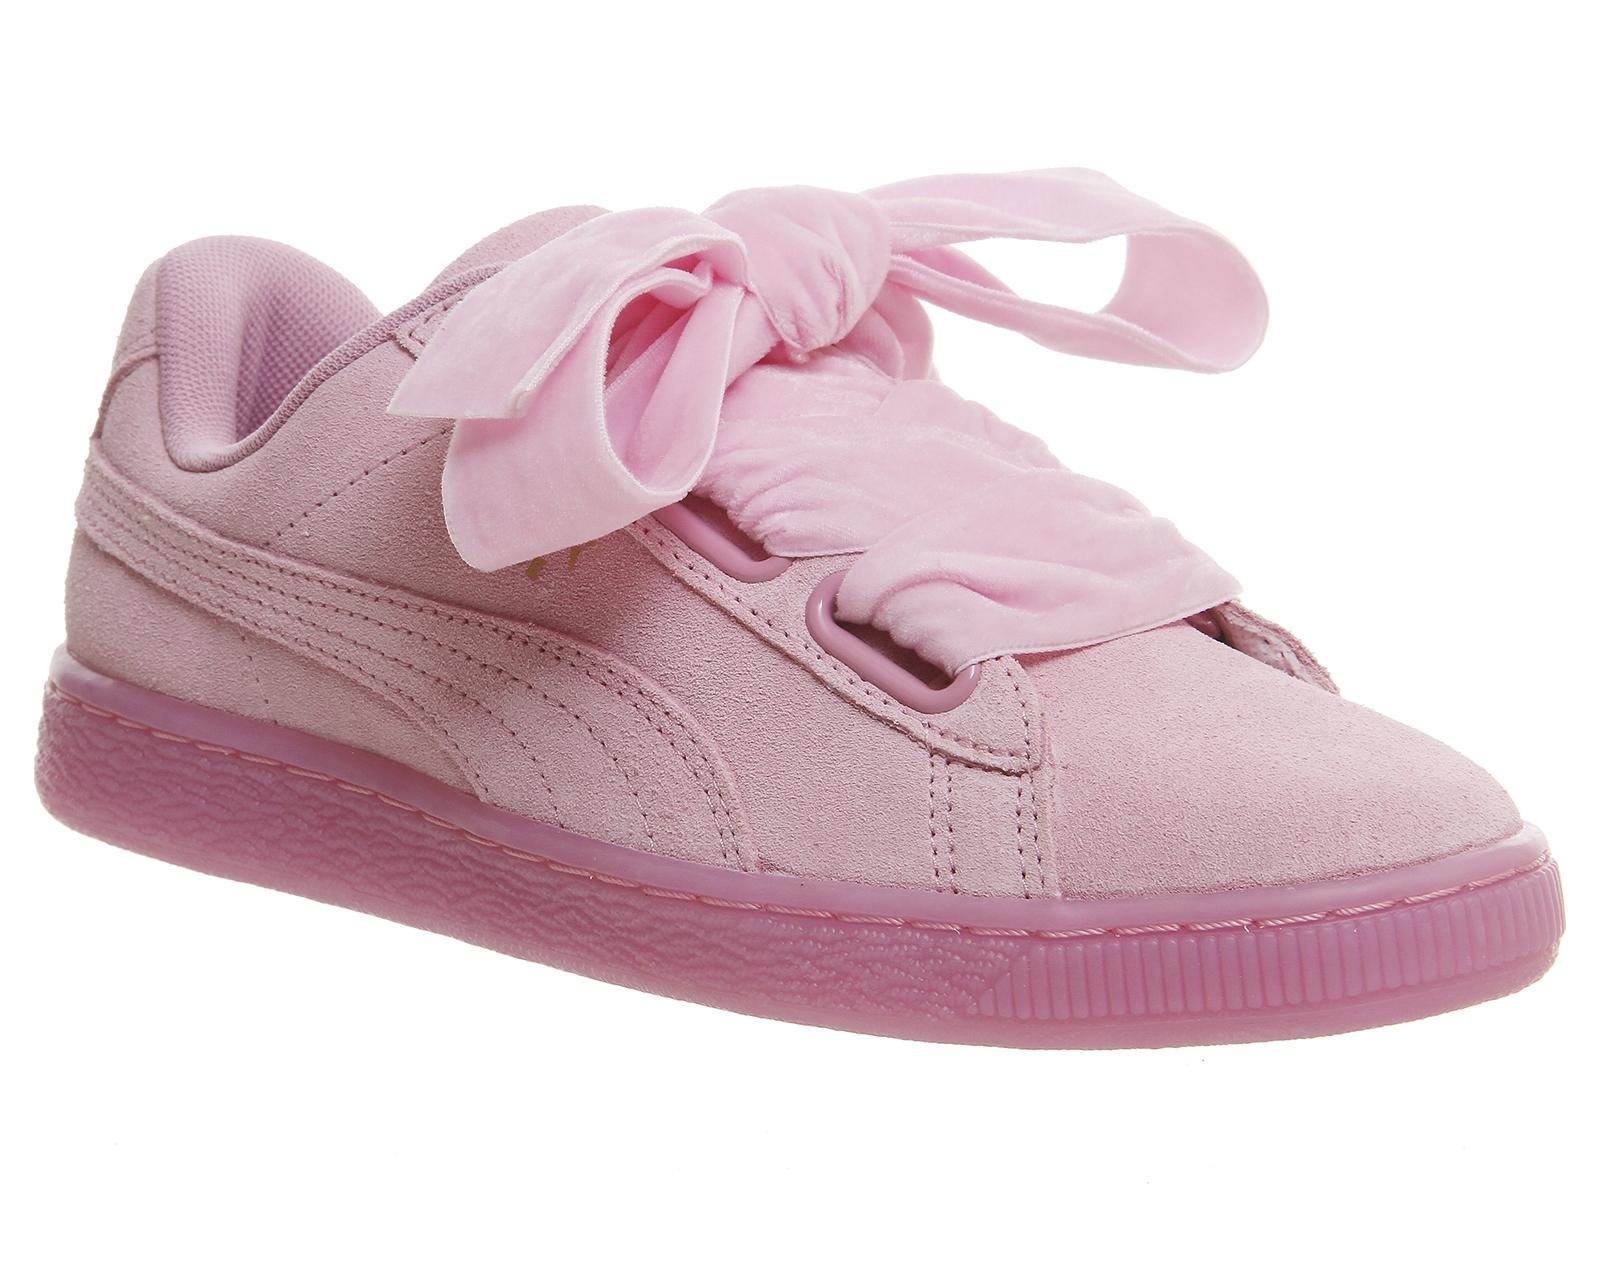 Baskets Puma Heart Suede rose ou bleu - Différentes tailles